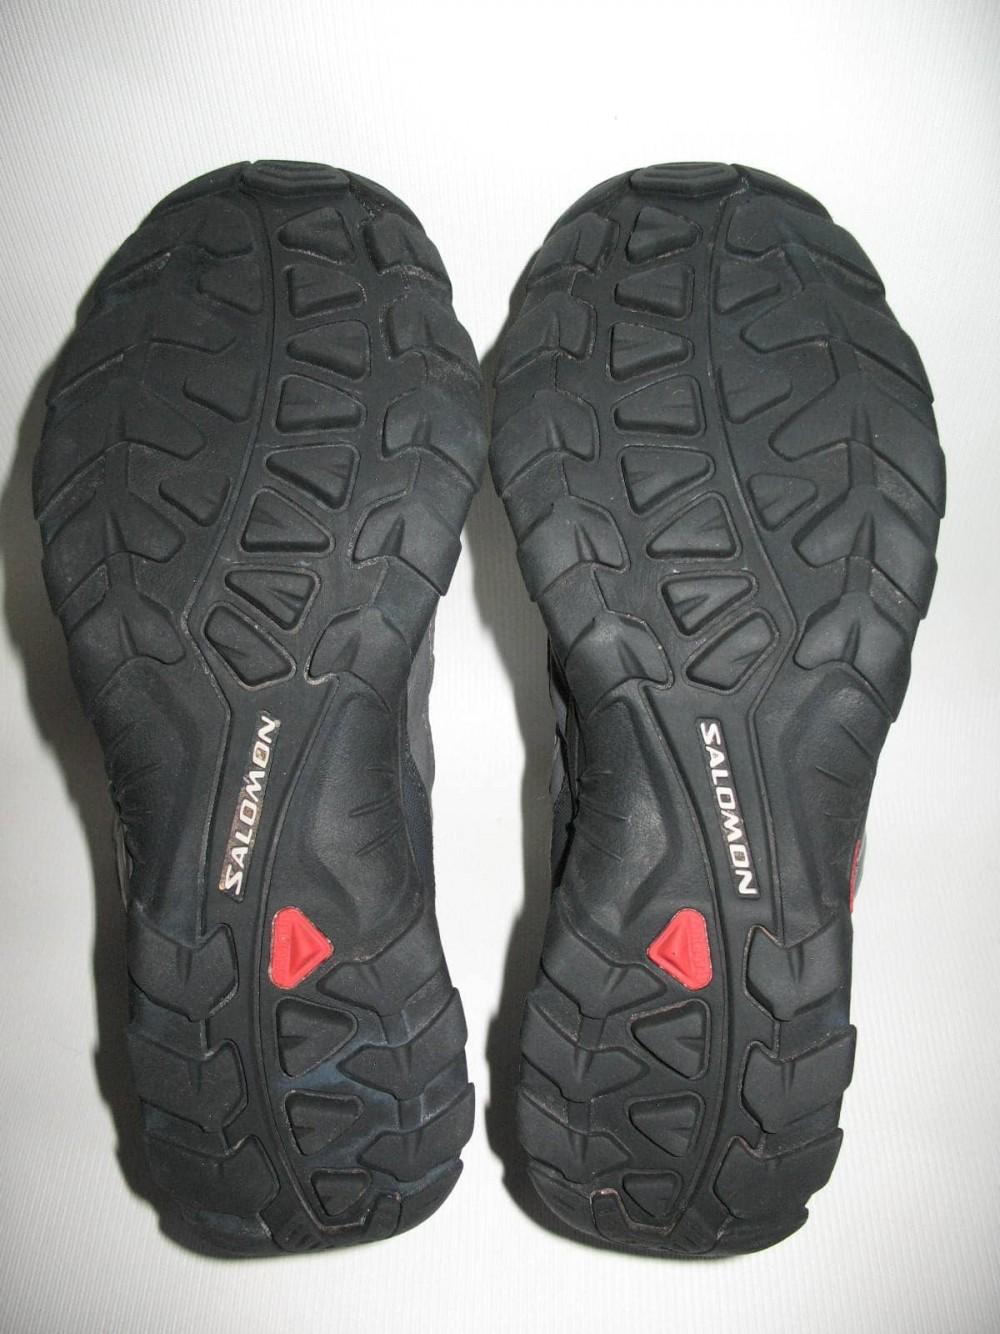 Кроссовки SALOMON gtx boots lady (размер US7,5/UK6/EU39,5(на стопу до 245 mm)) - 7